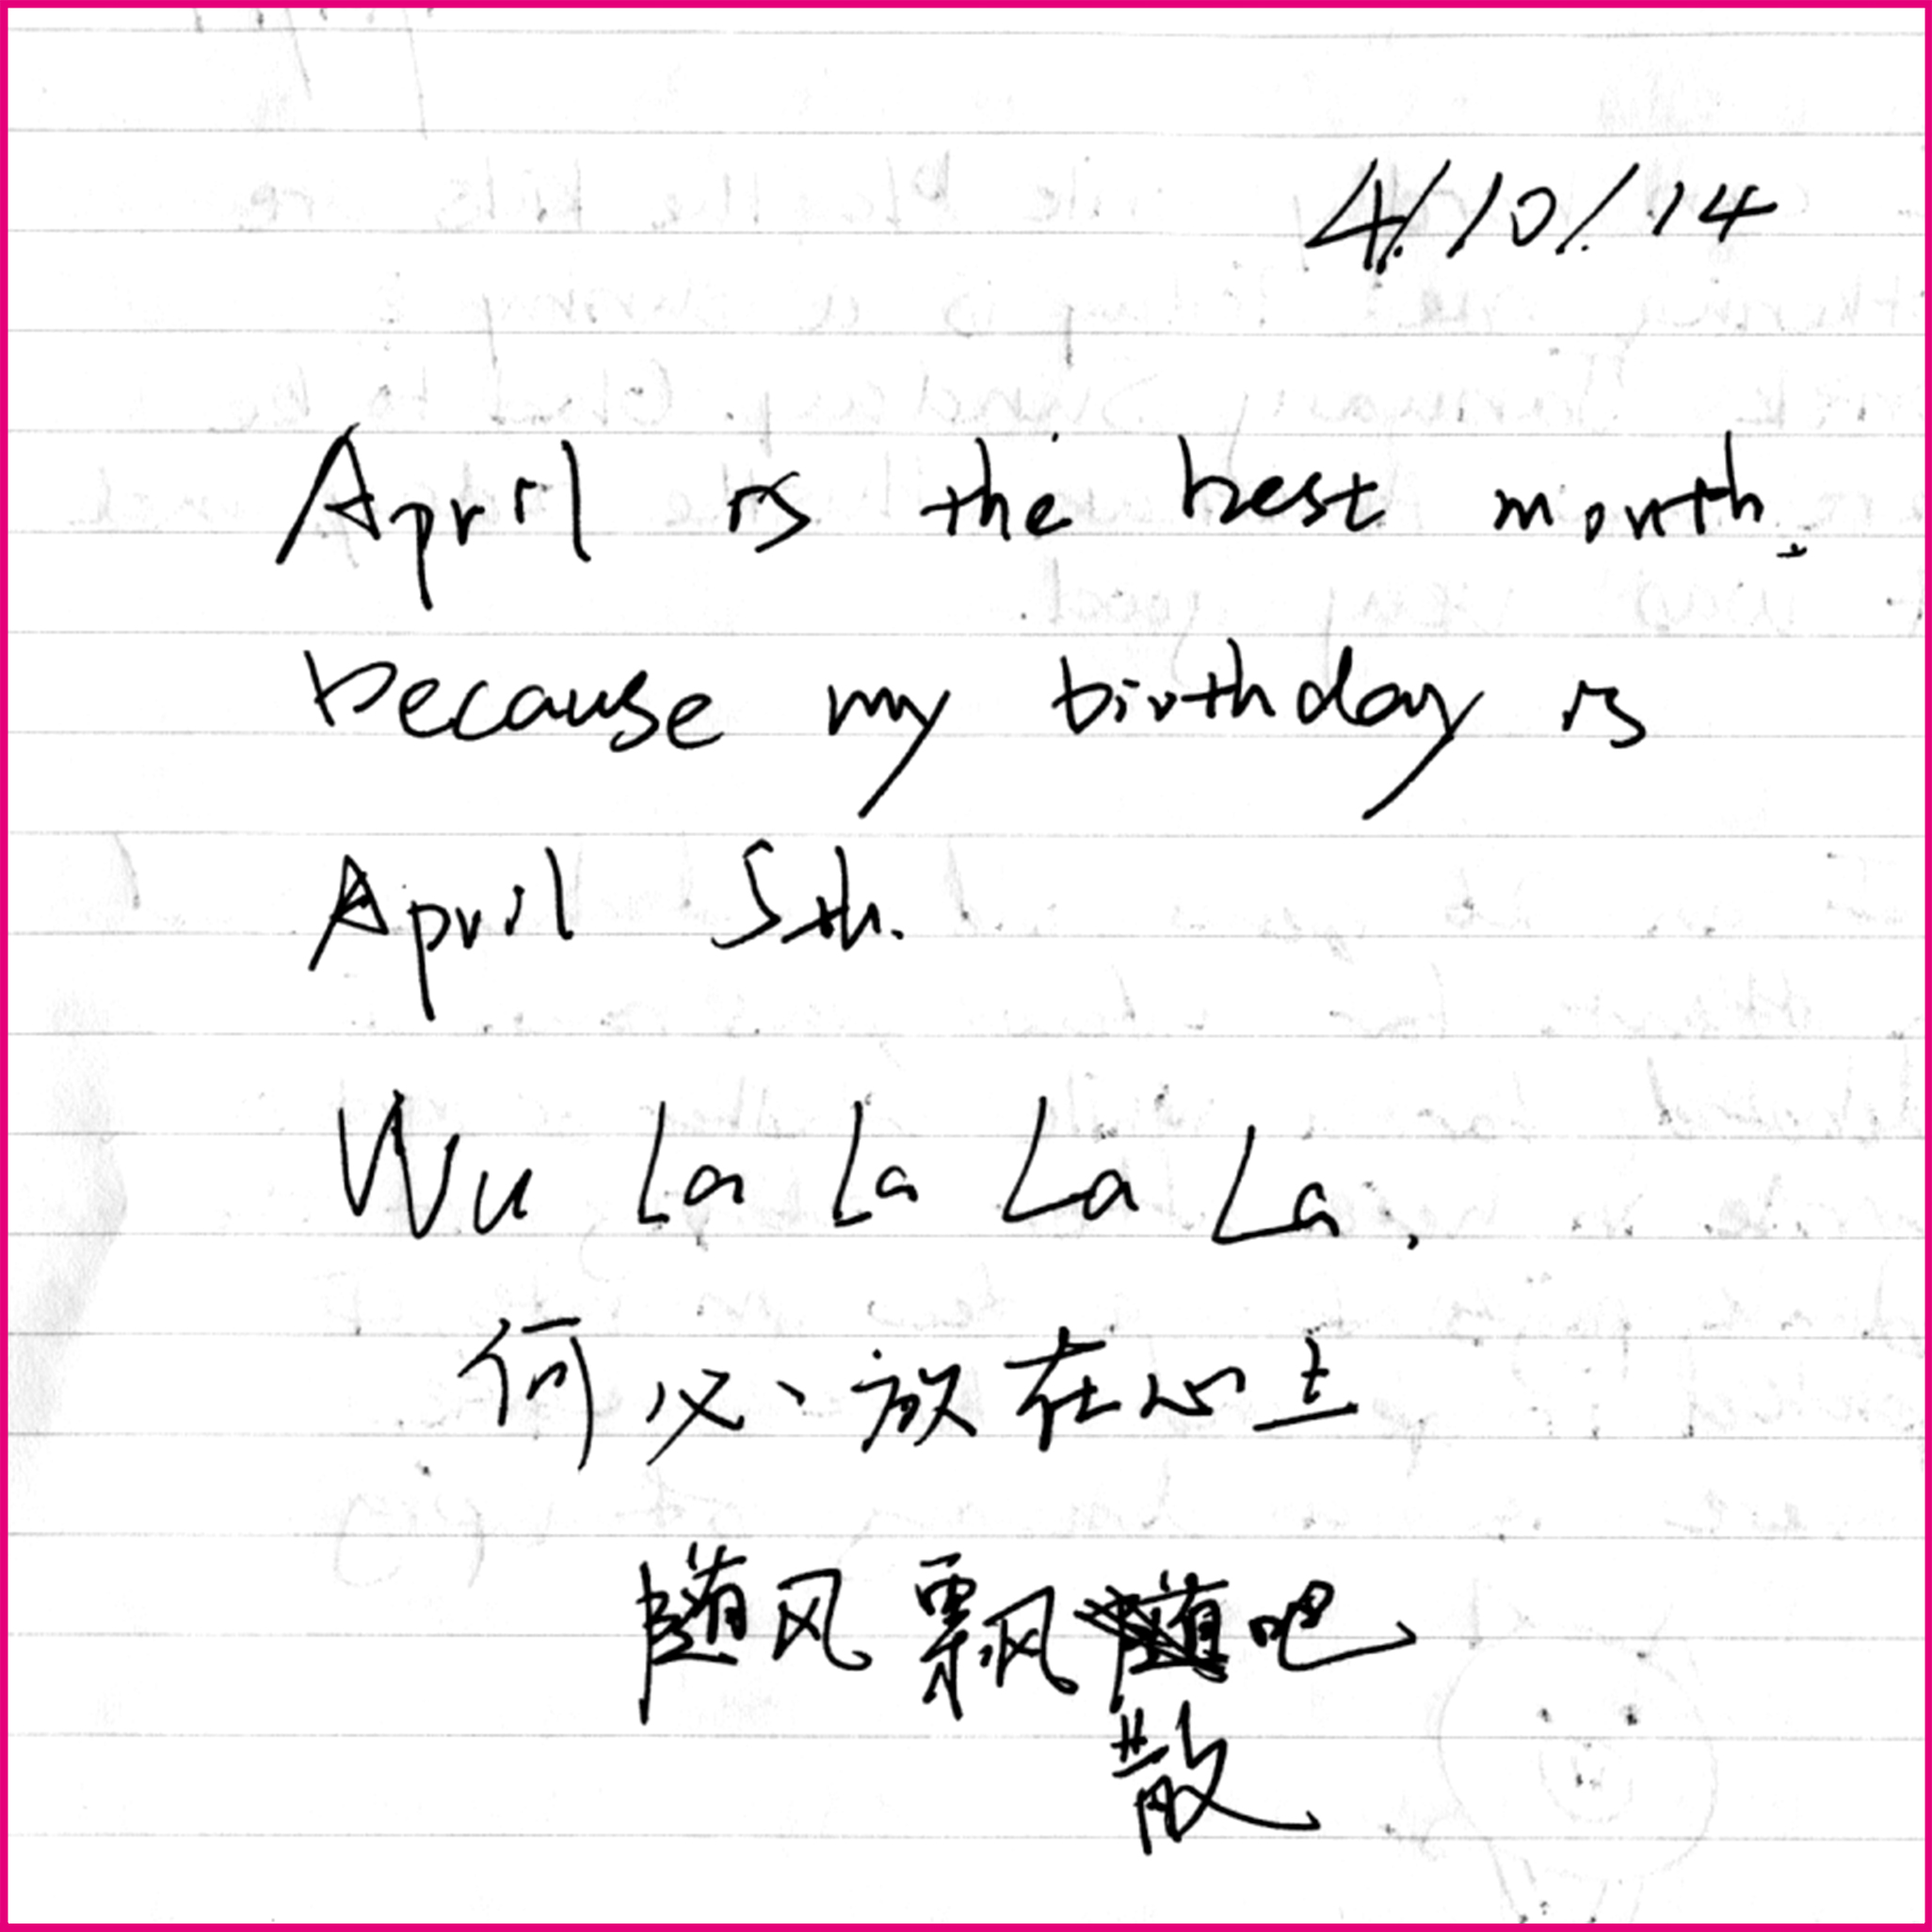 April is the best month because my birthday is April 5th. Wu la la la la.